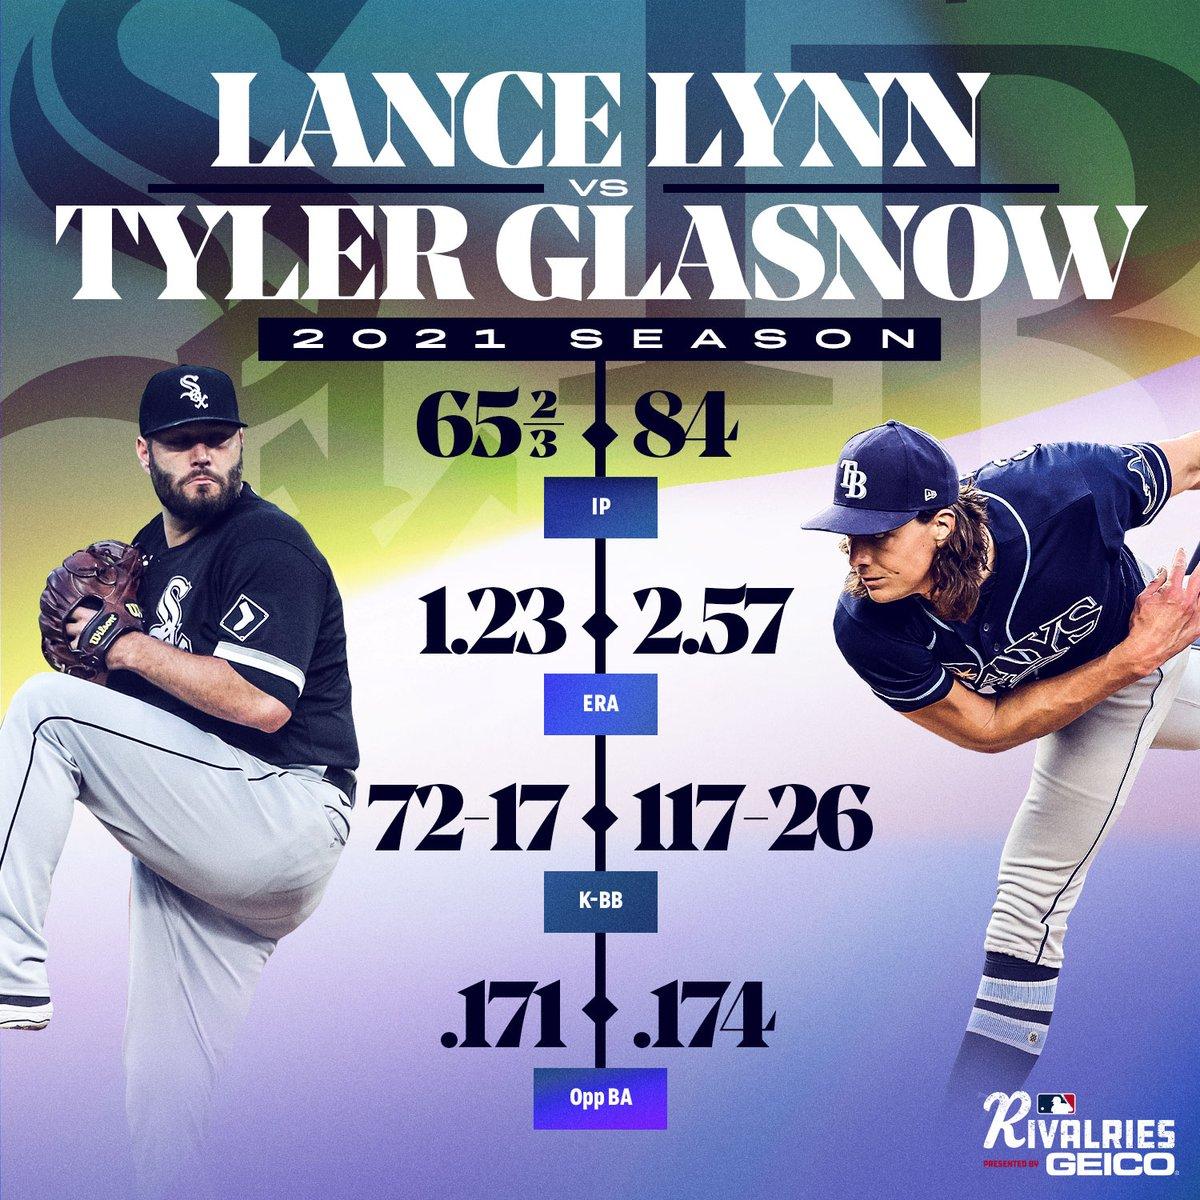 @MLBStats's photo on Lance Lynn